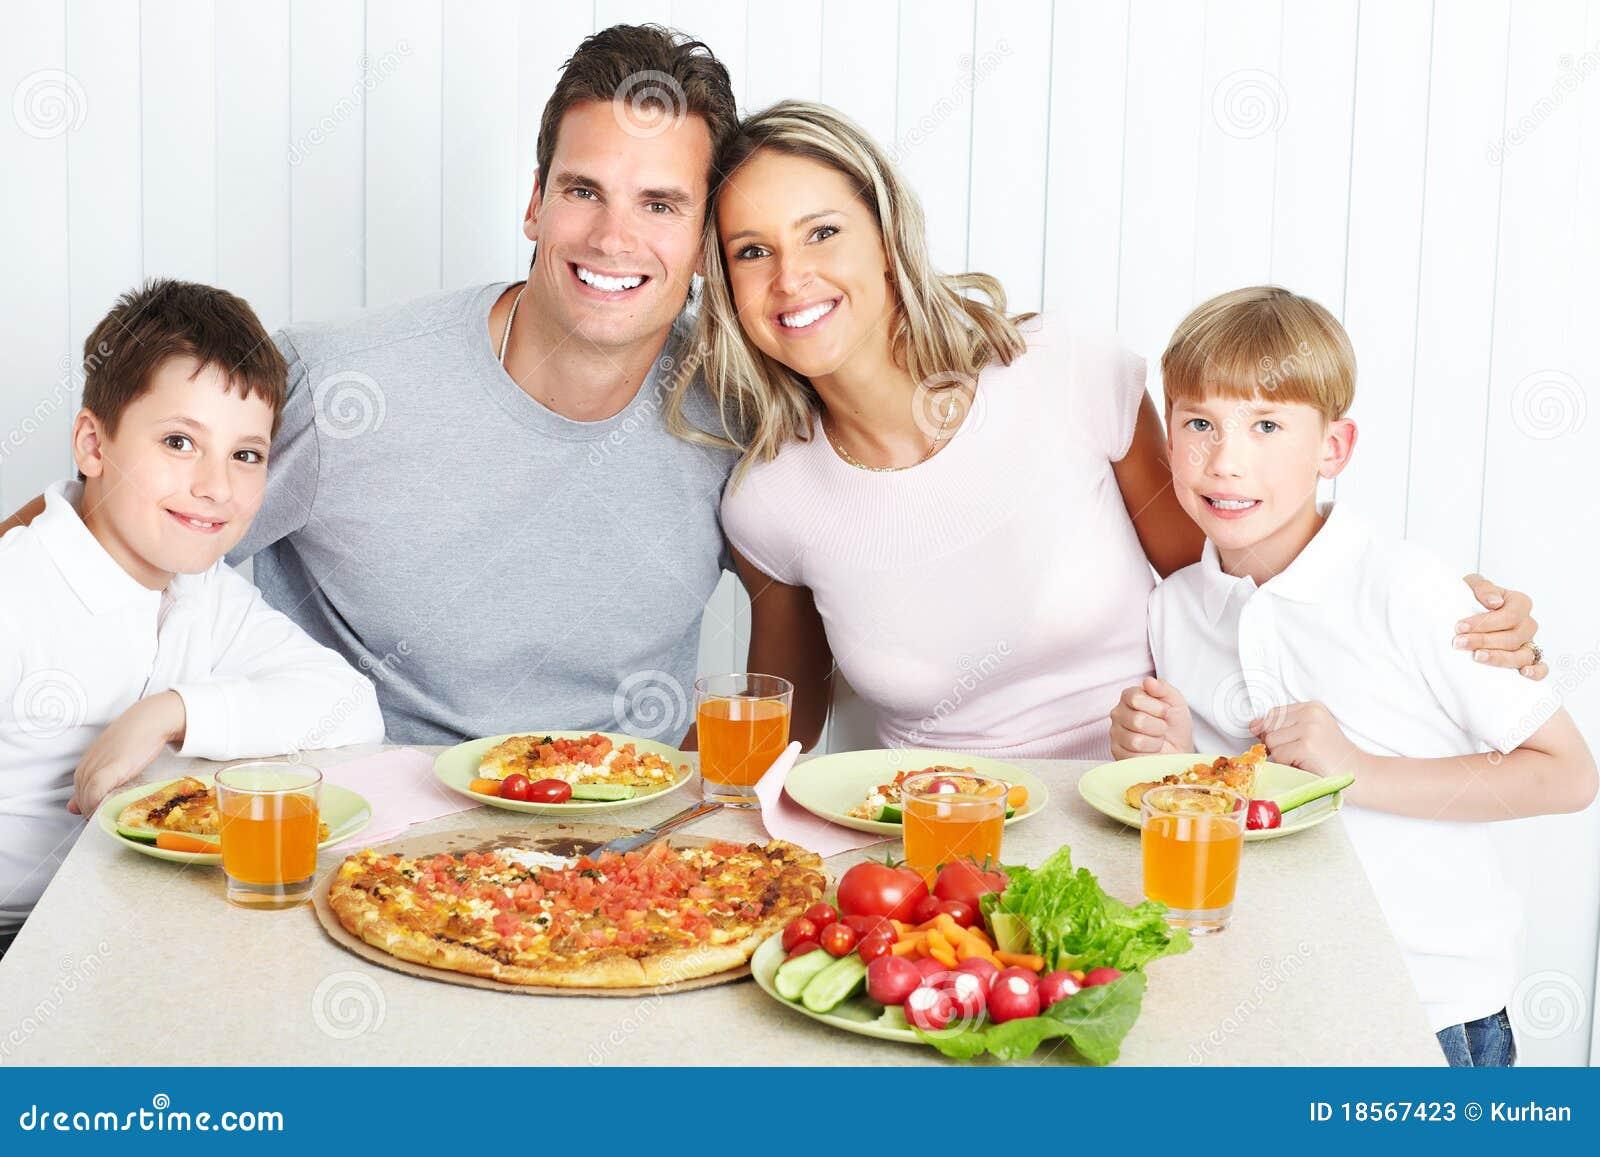 papa mama pizza